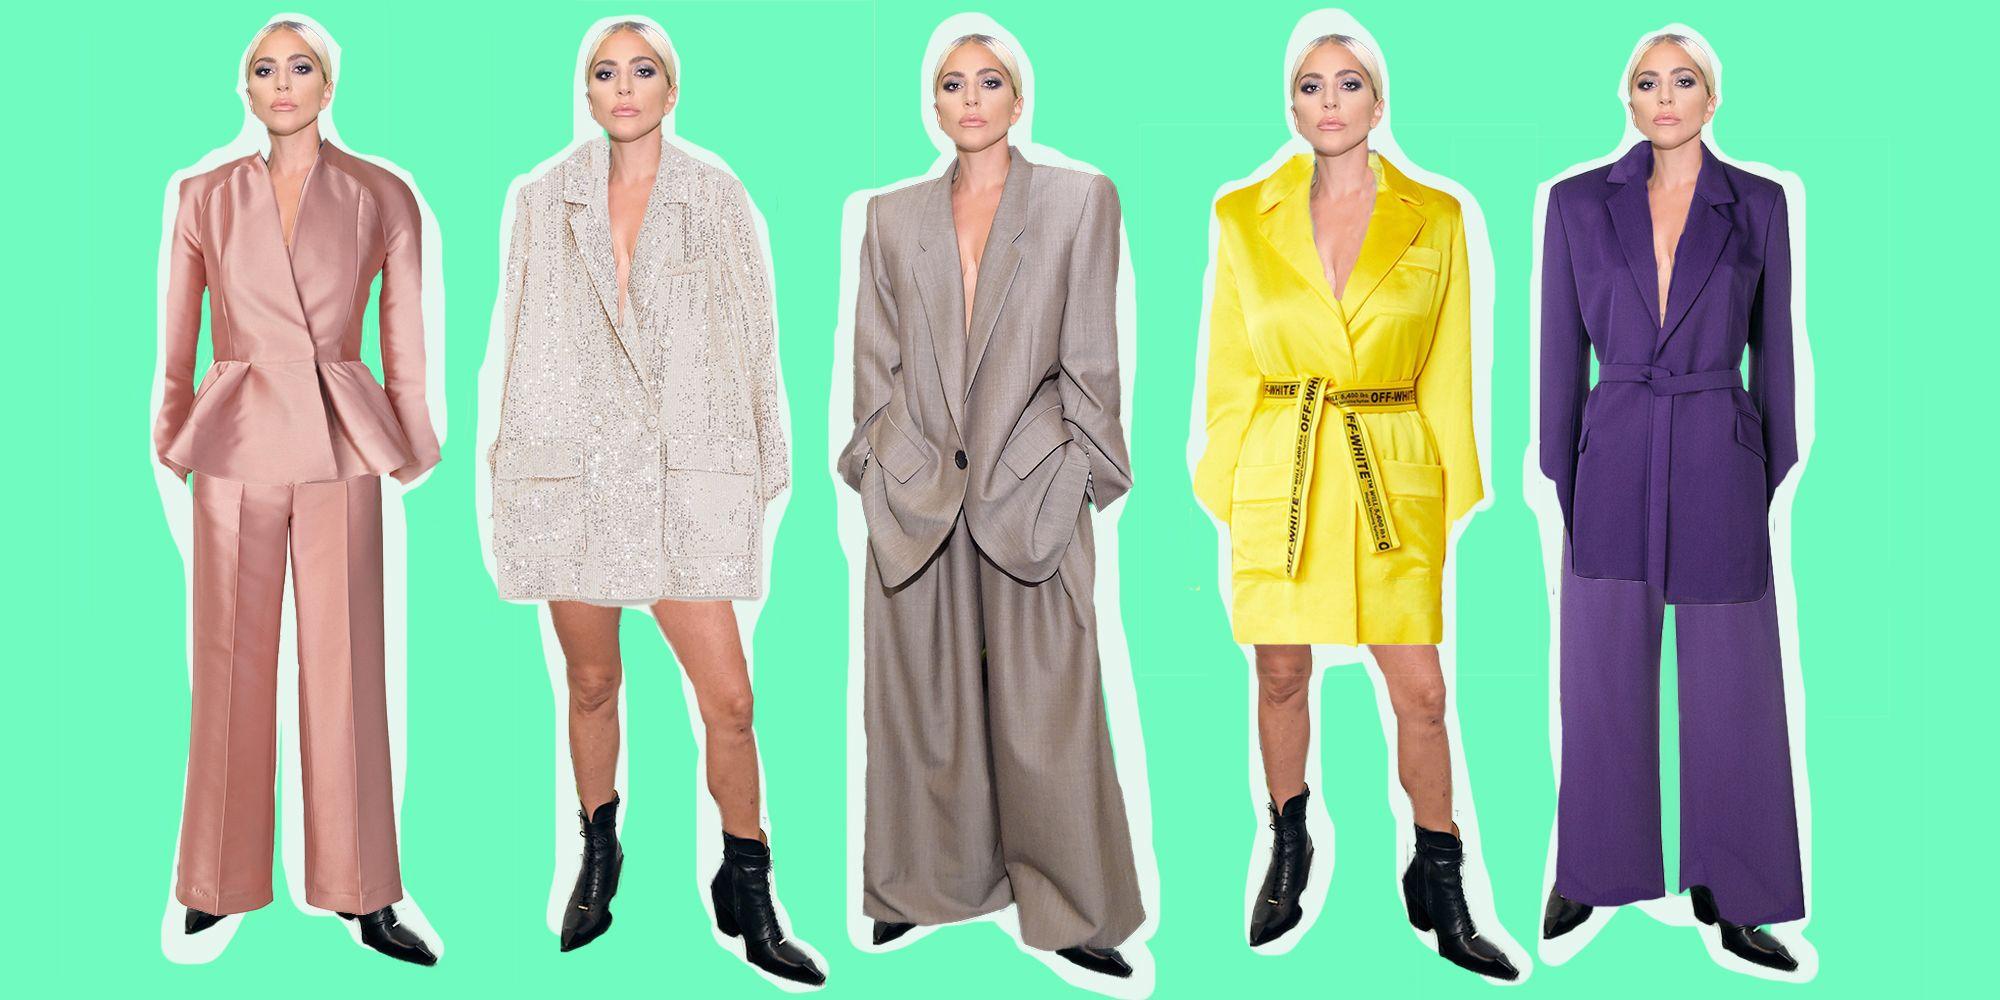 Pakken shopping 2018-2019